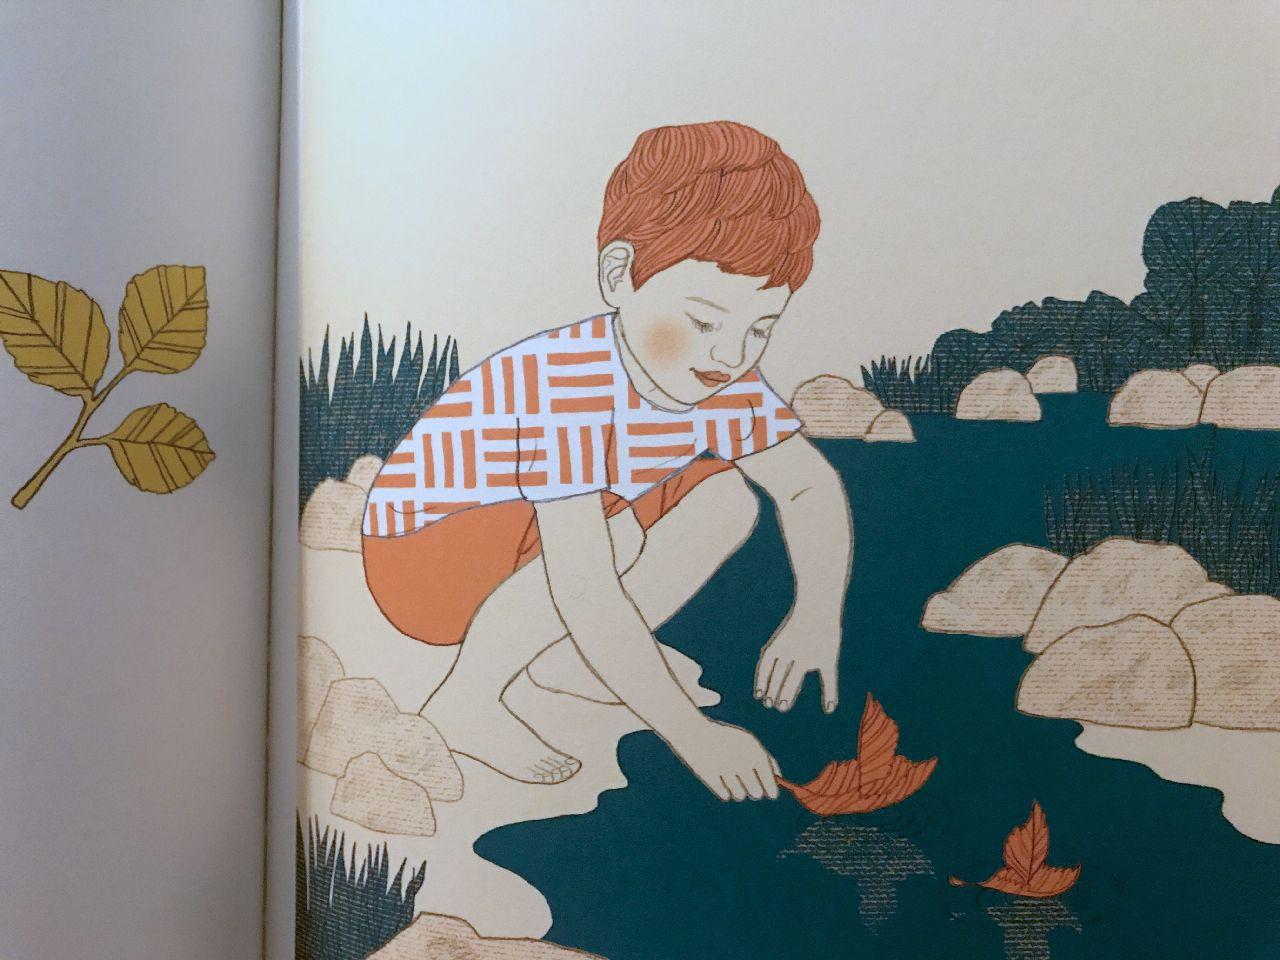 Robert Louis Stevenson - Ilya Green, Piccolo giardino di poesie, Rizzoli